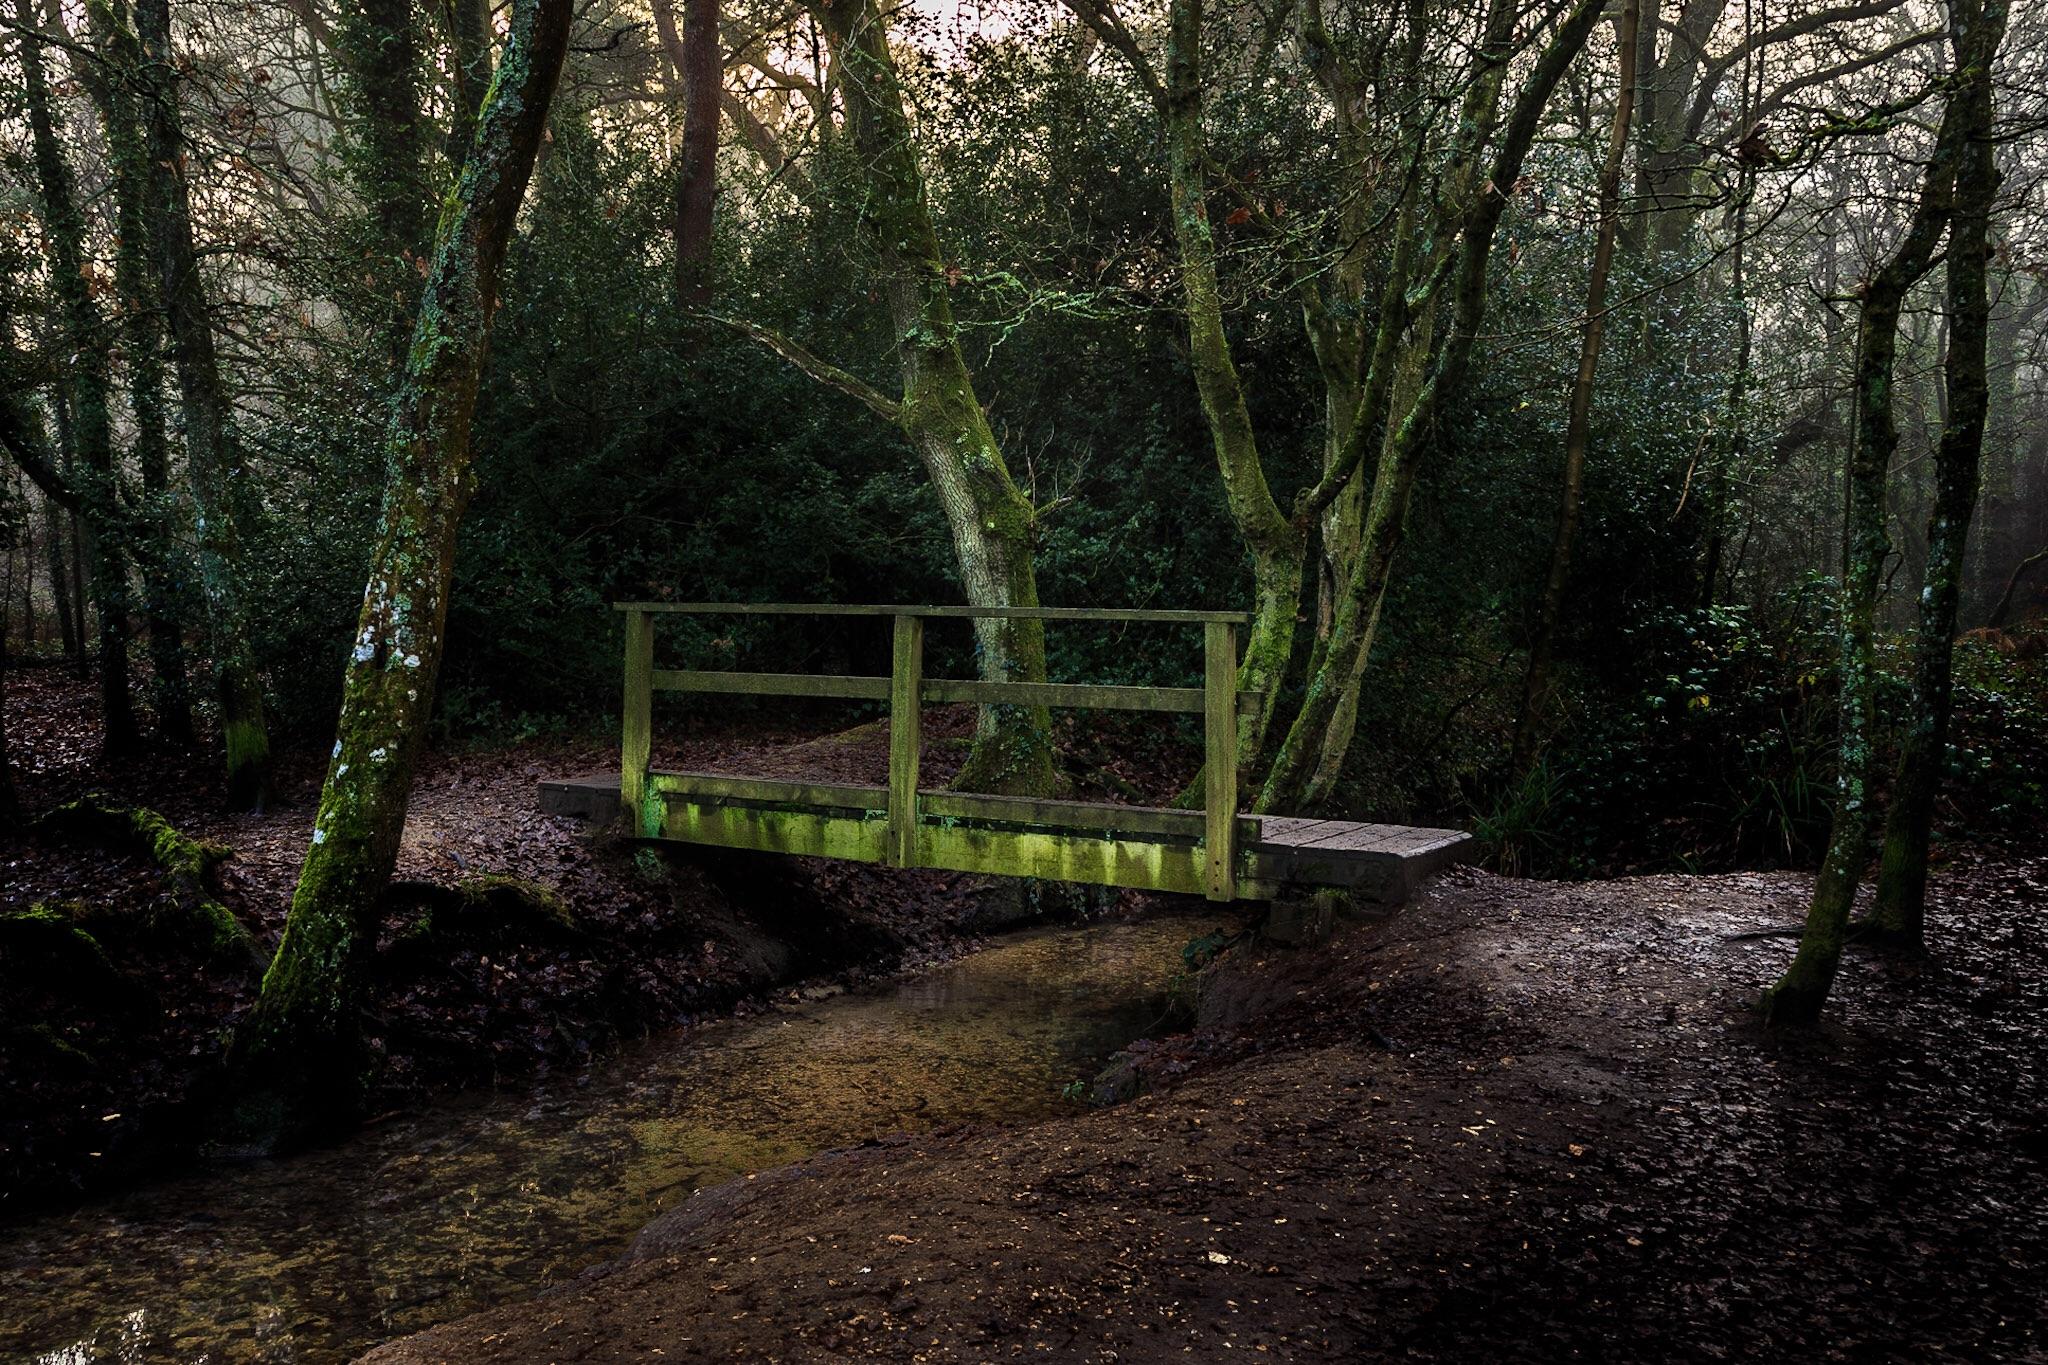 Footbridge in the woods - the original composition